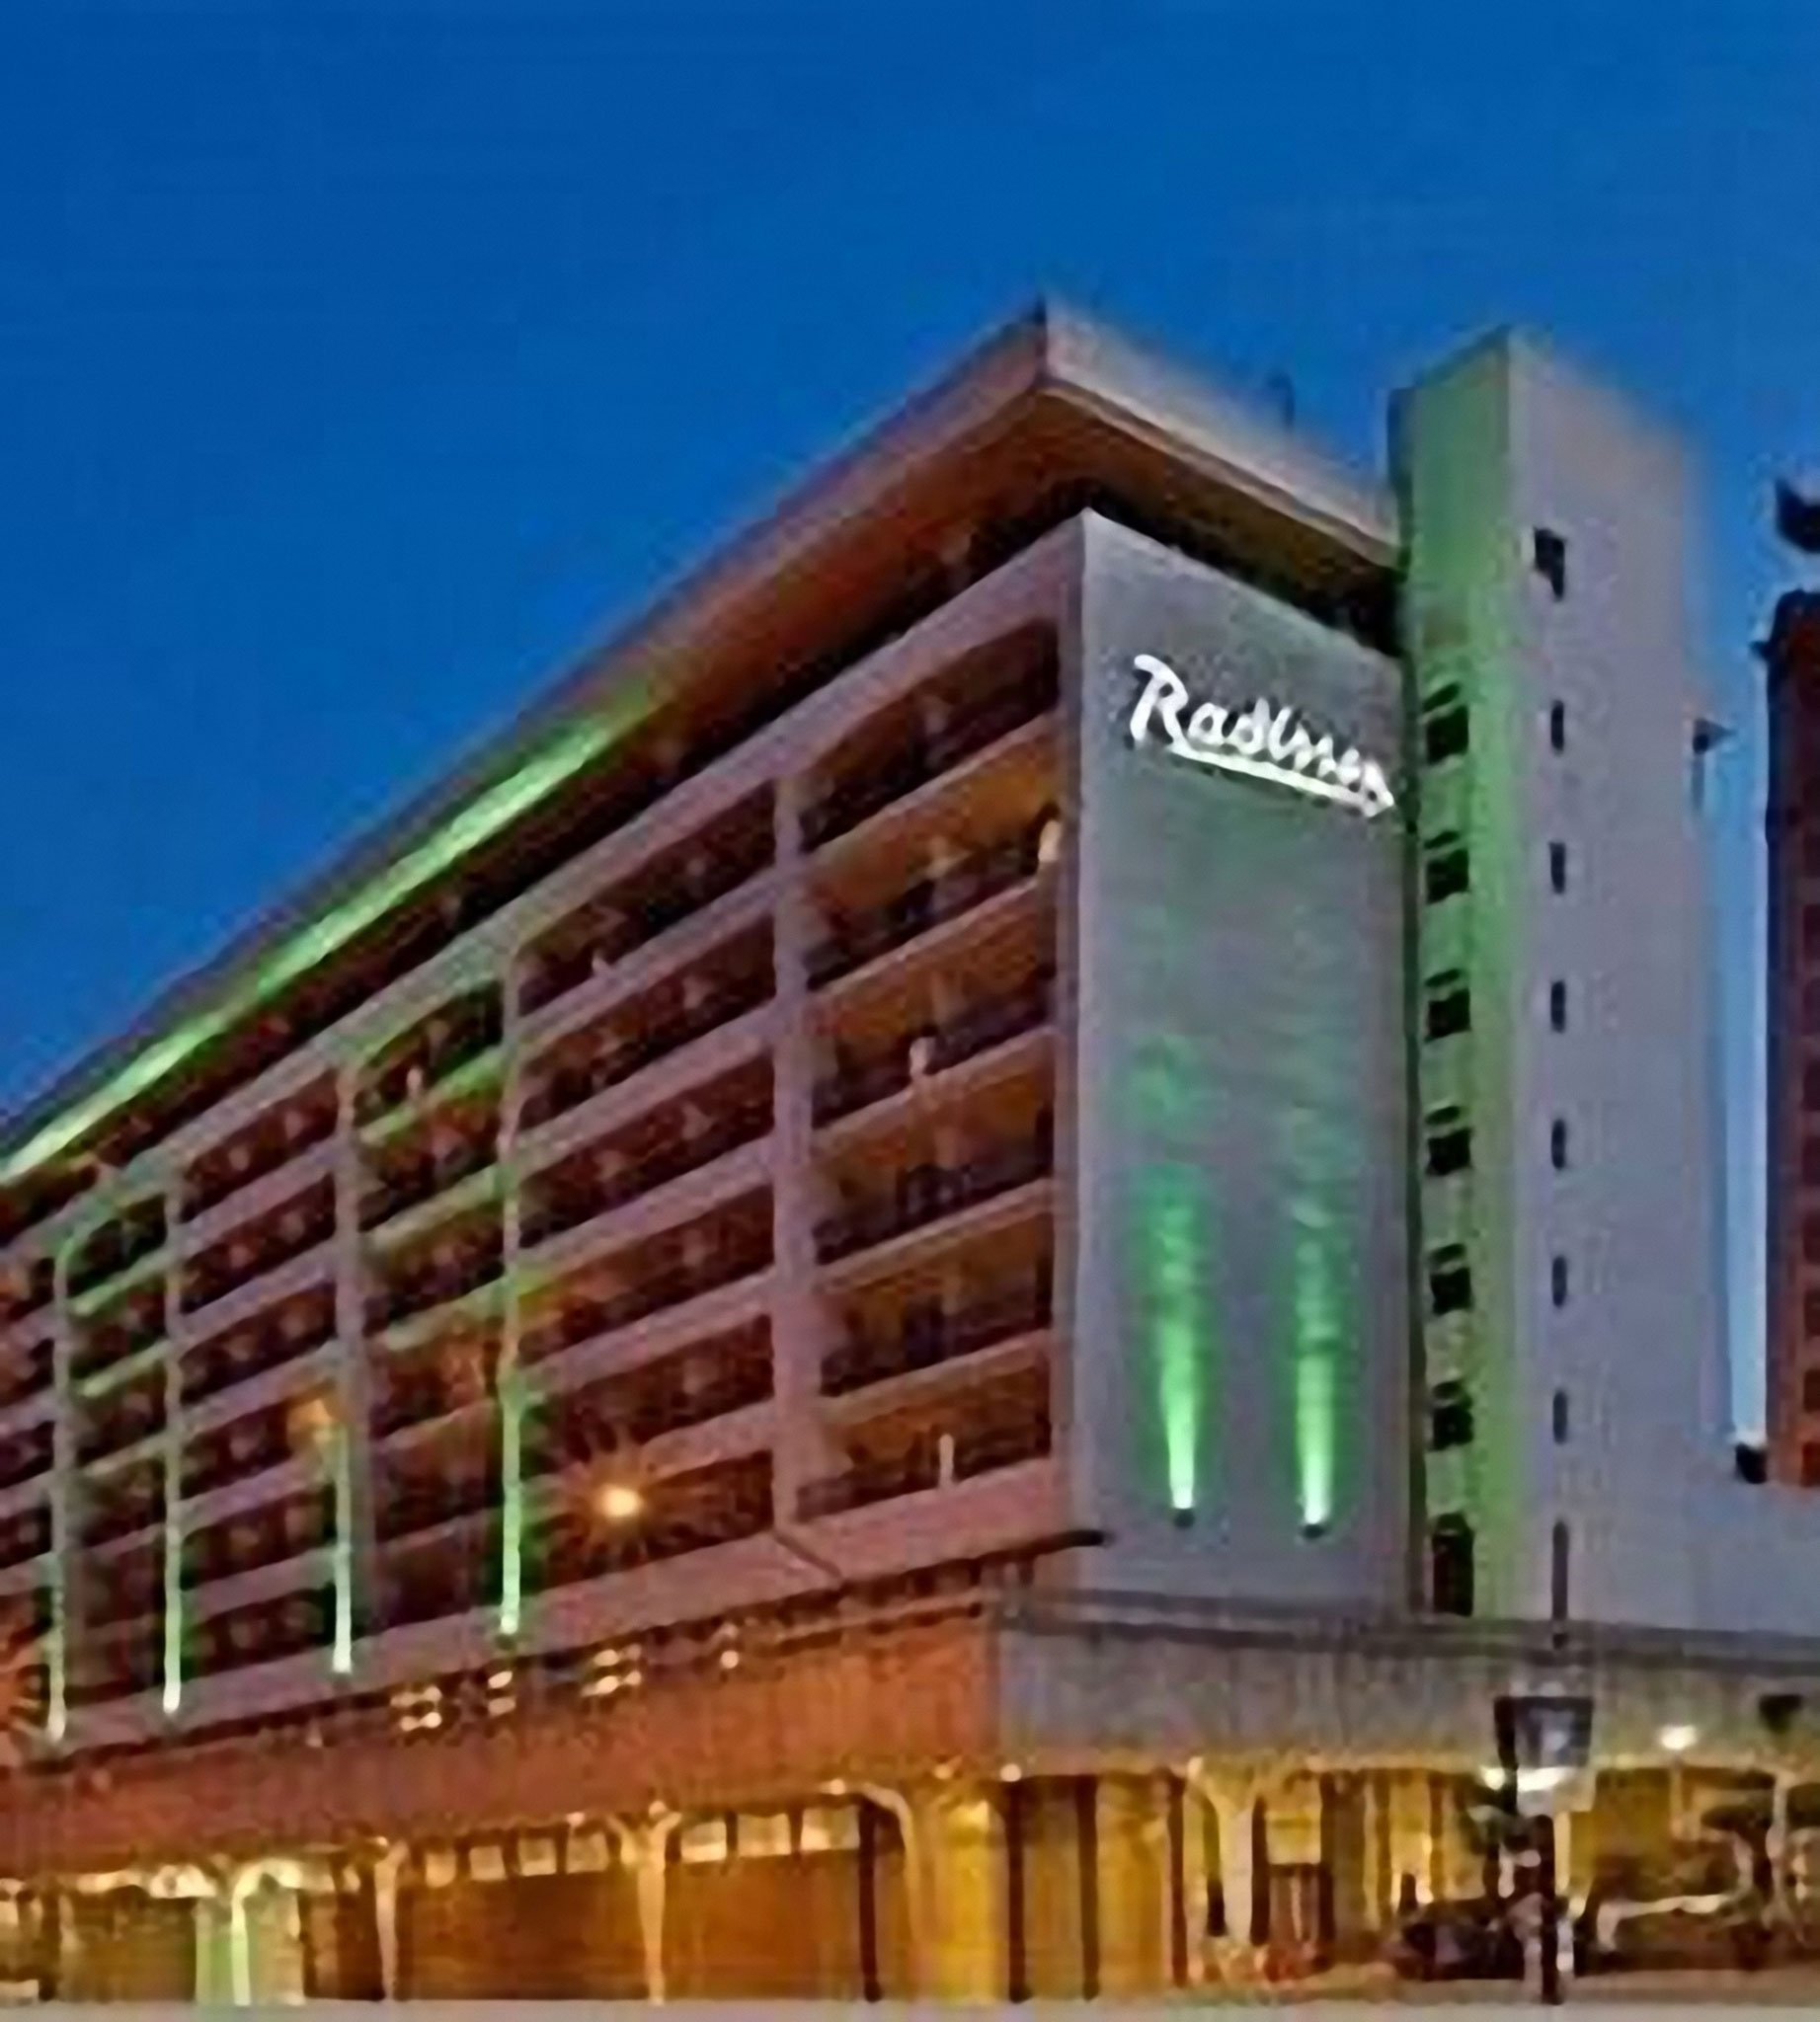 Fresno - Radisson Hotel*** - 2N